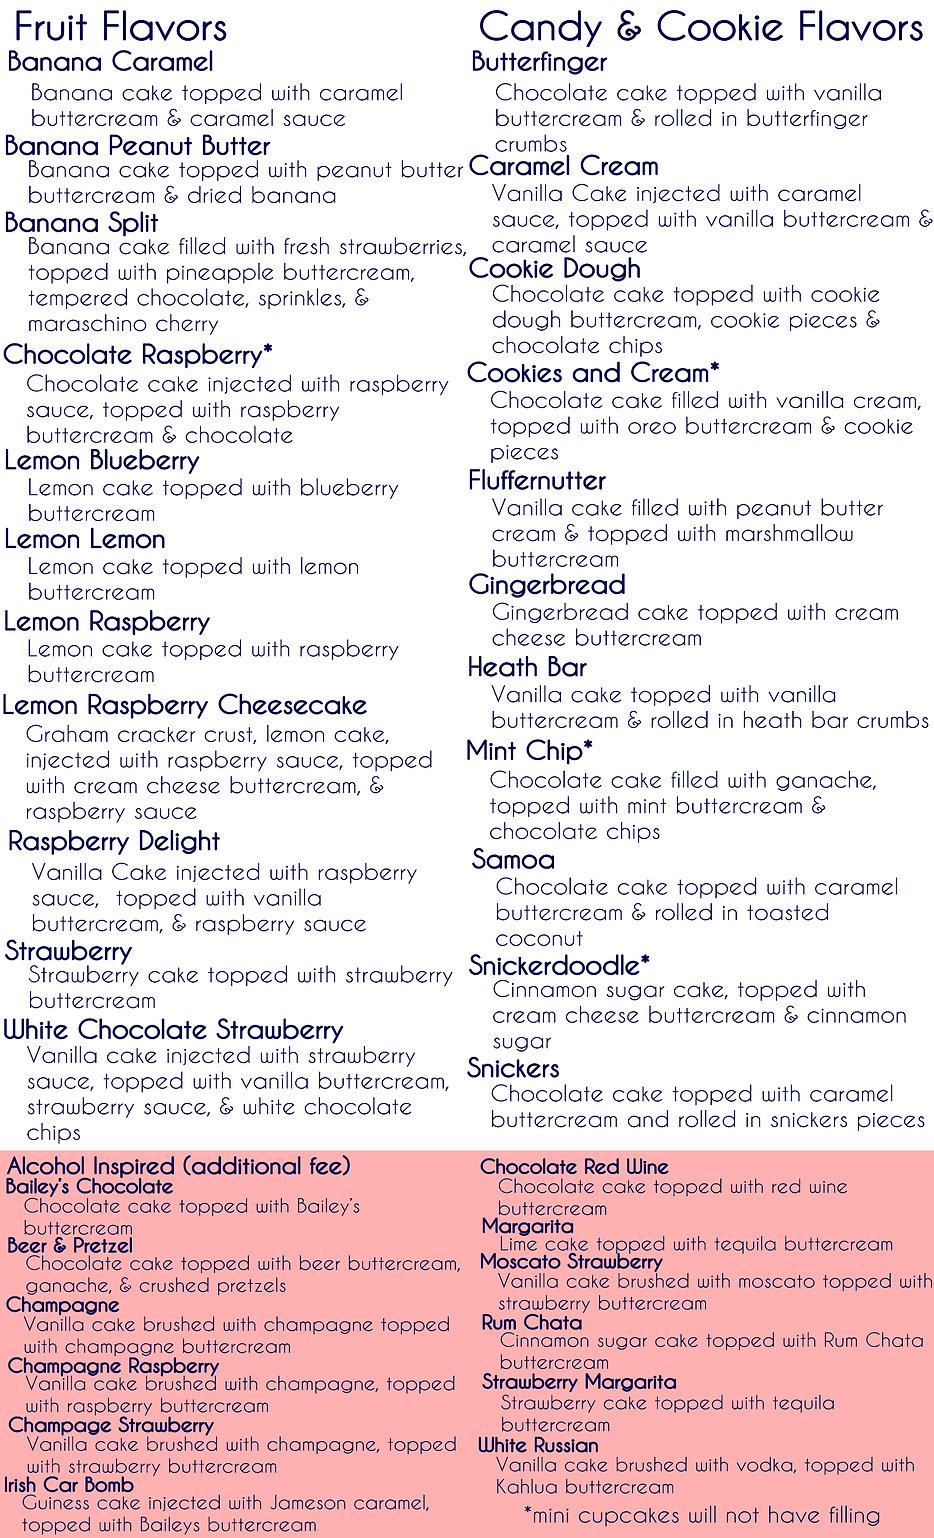 flavor list 2.jpg